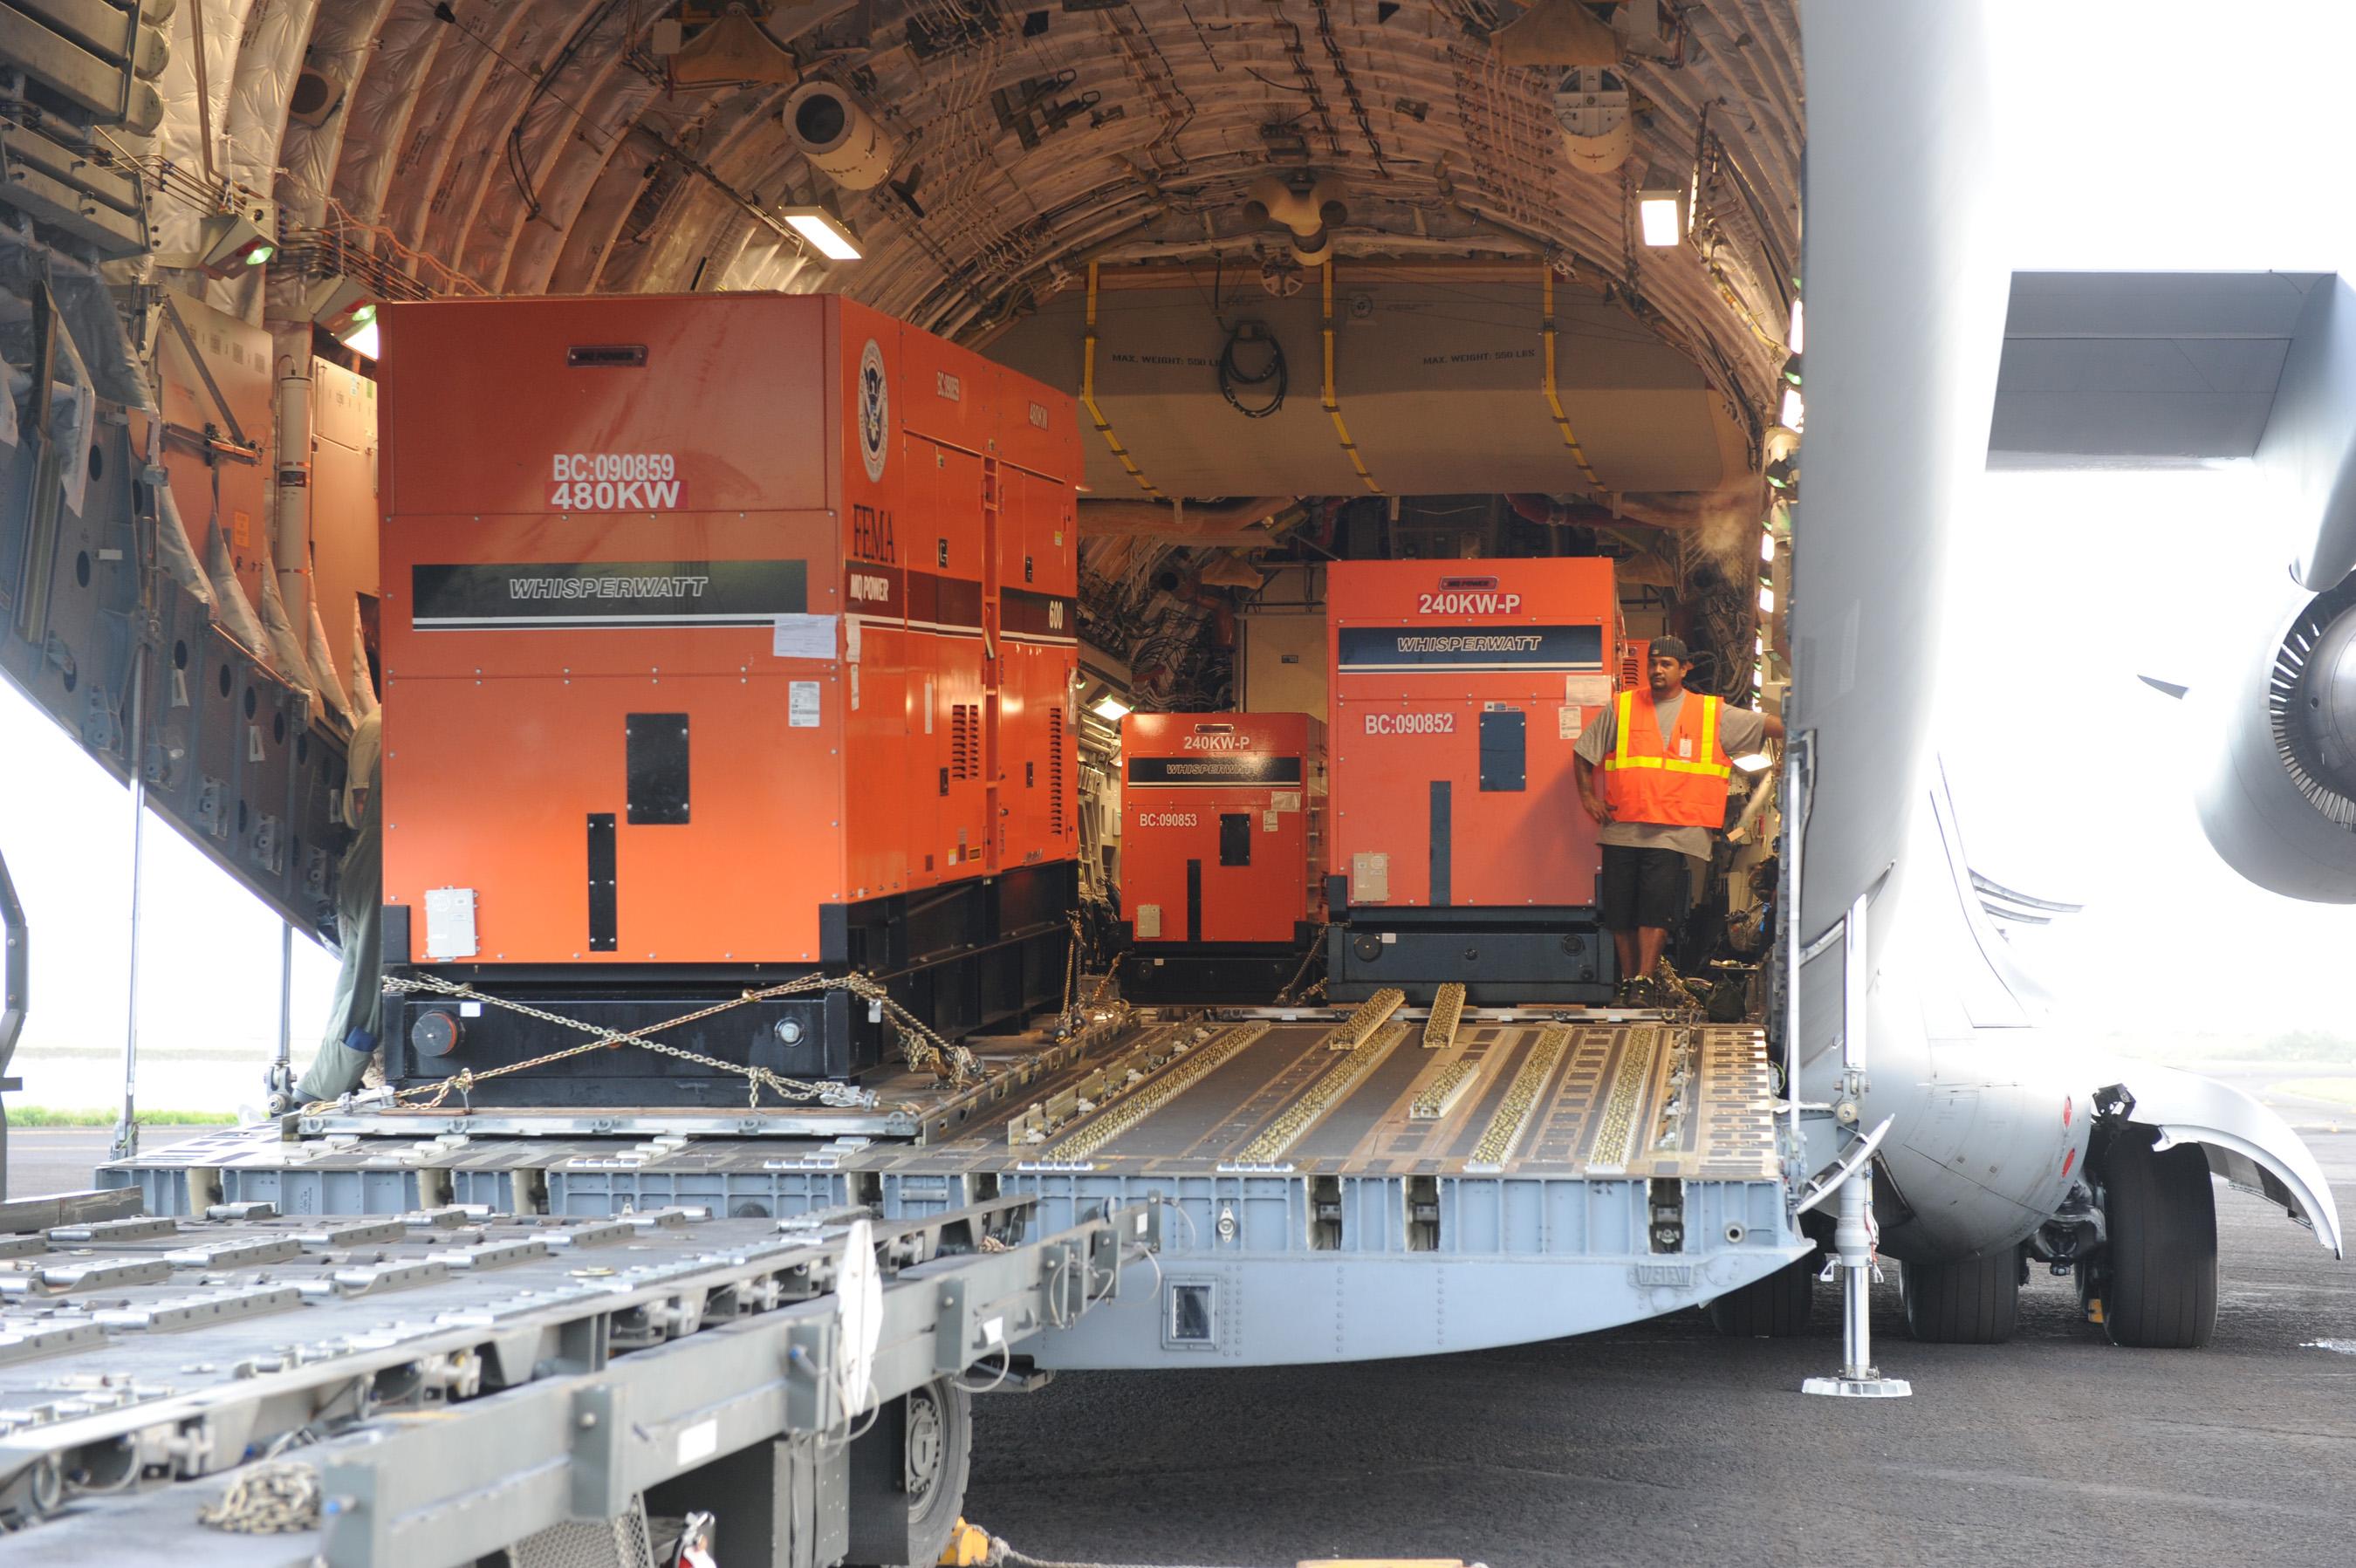 File FEMA Emergency Generators being unloaded from a C